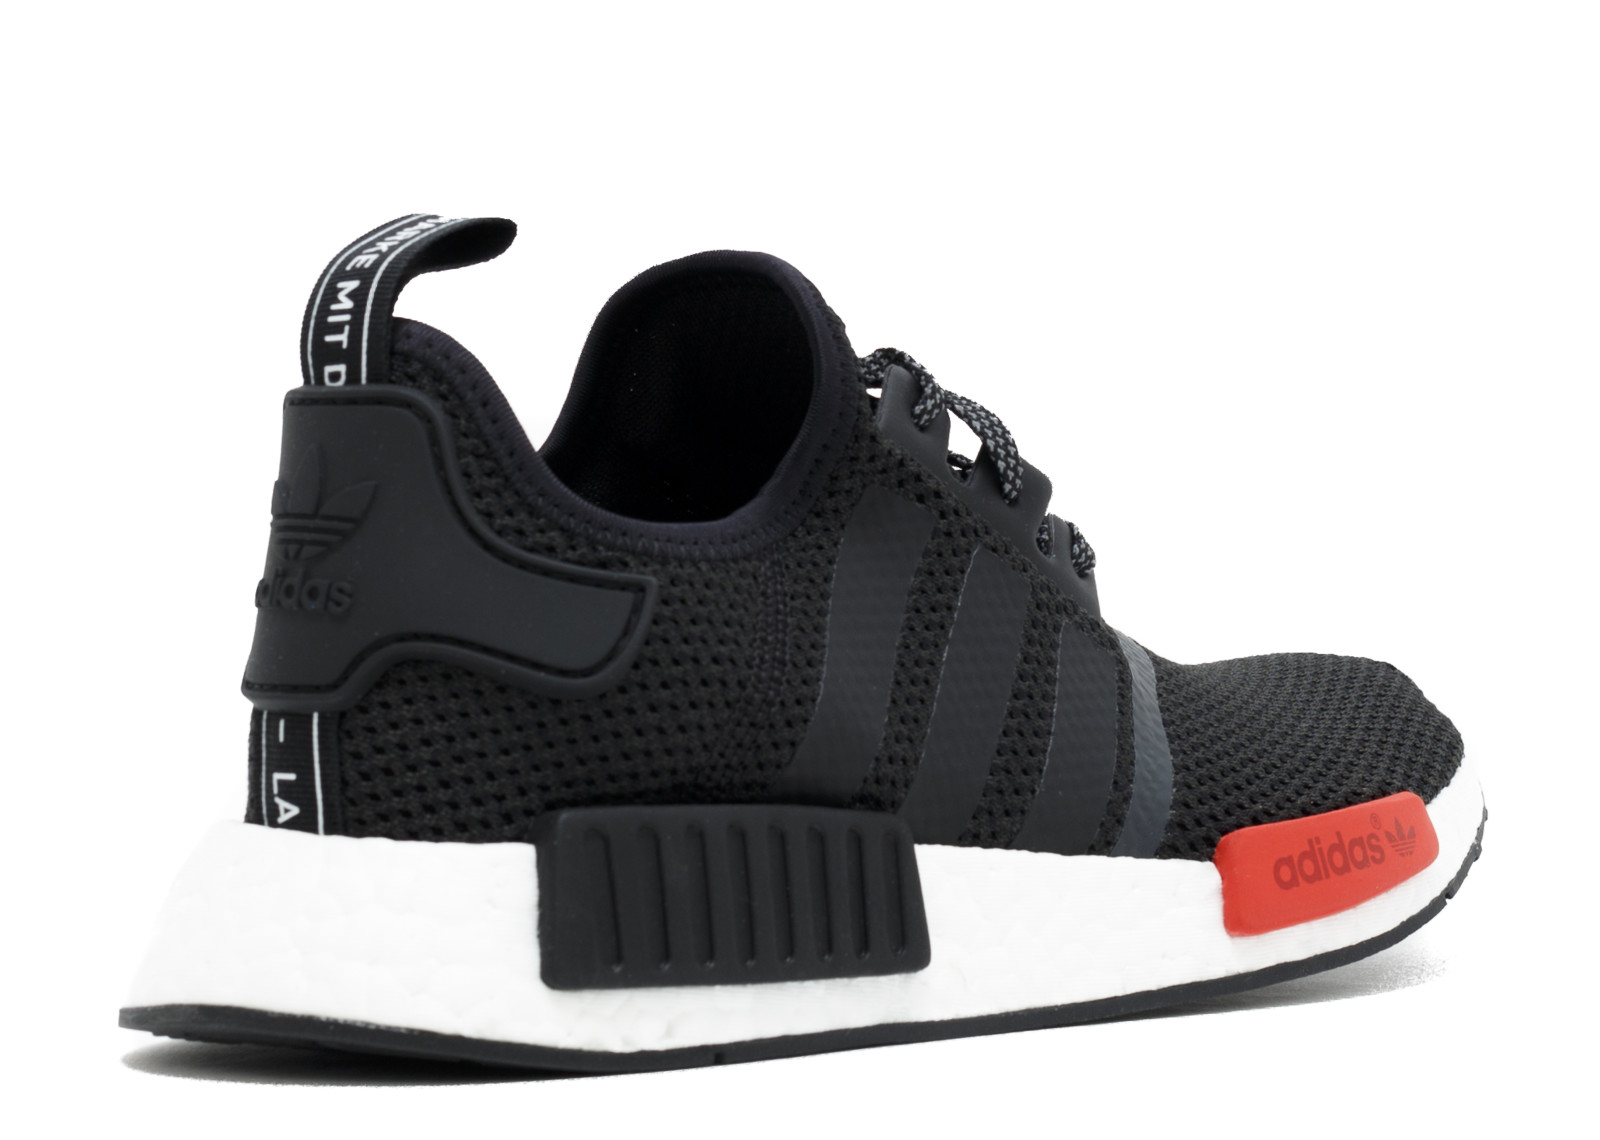 c75f0c169c9d1 Adidas NMD R1 Footlocker Black Red - 3